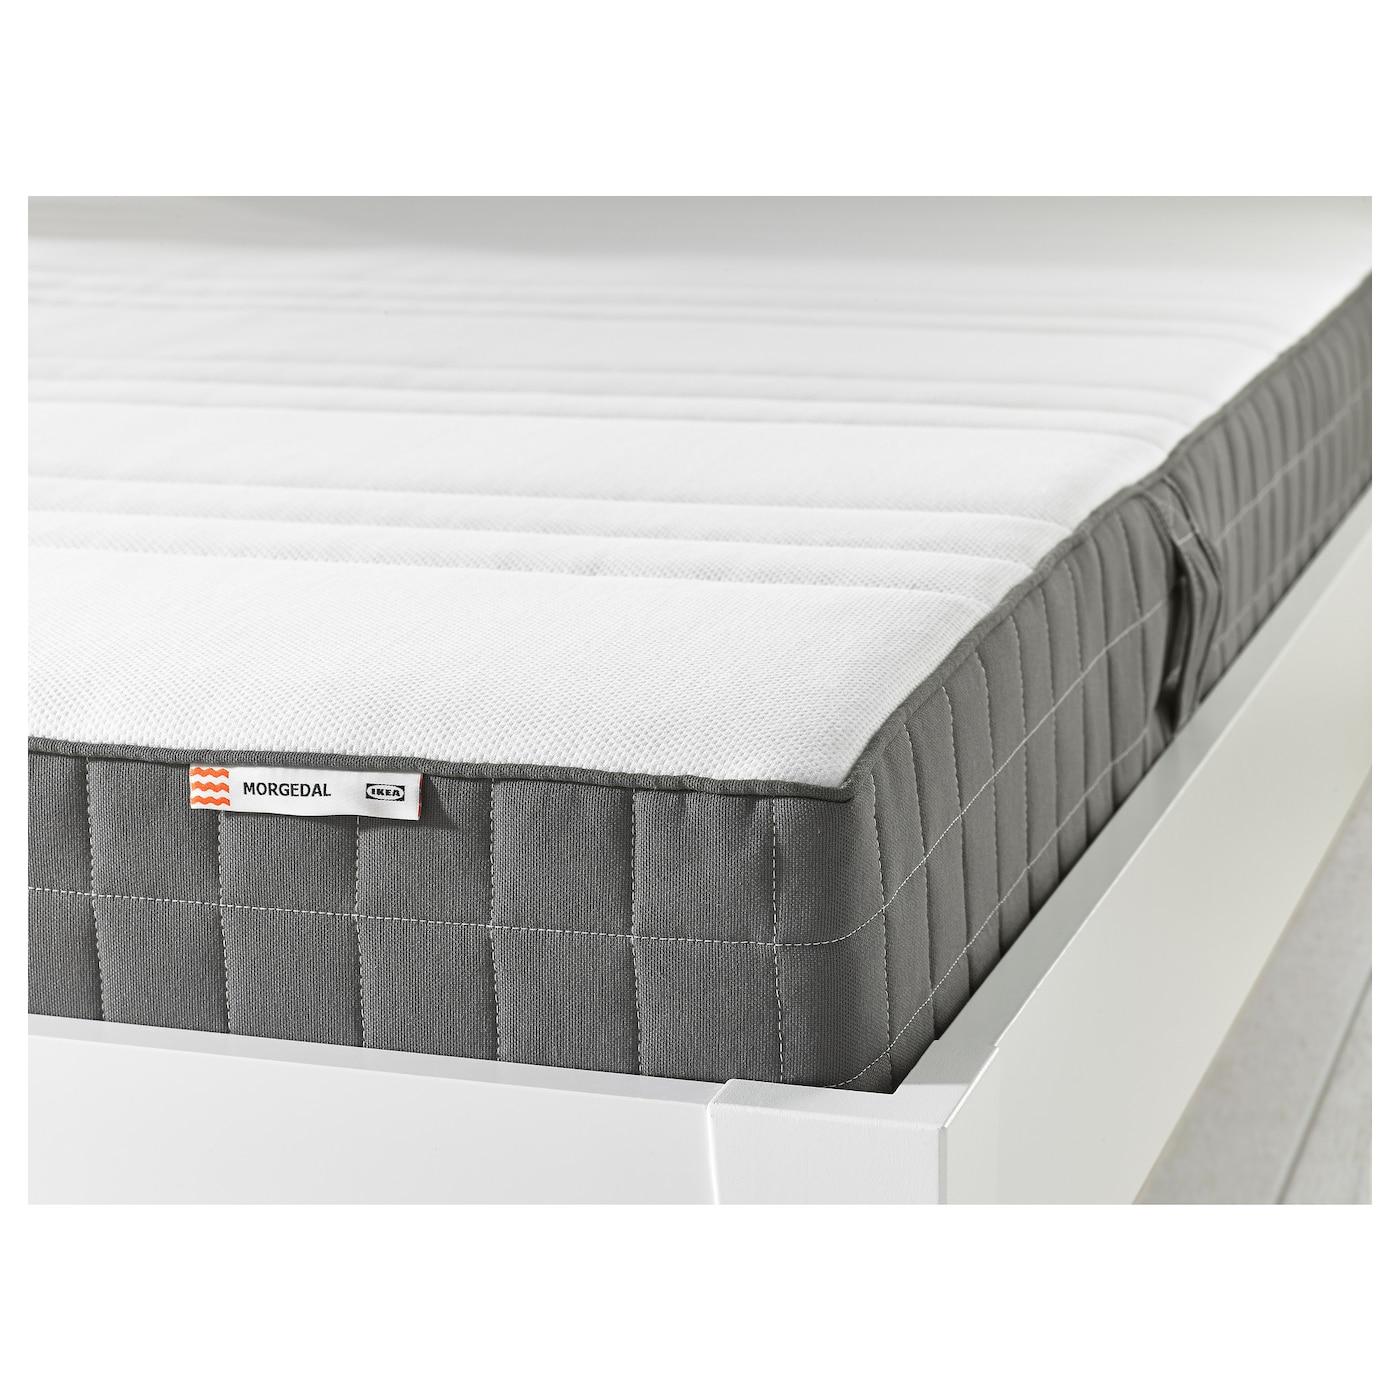 Morgedal Medium Firm Dark Grey Memory Foam Mattress Standard